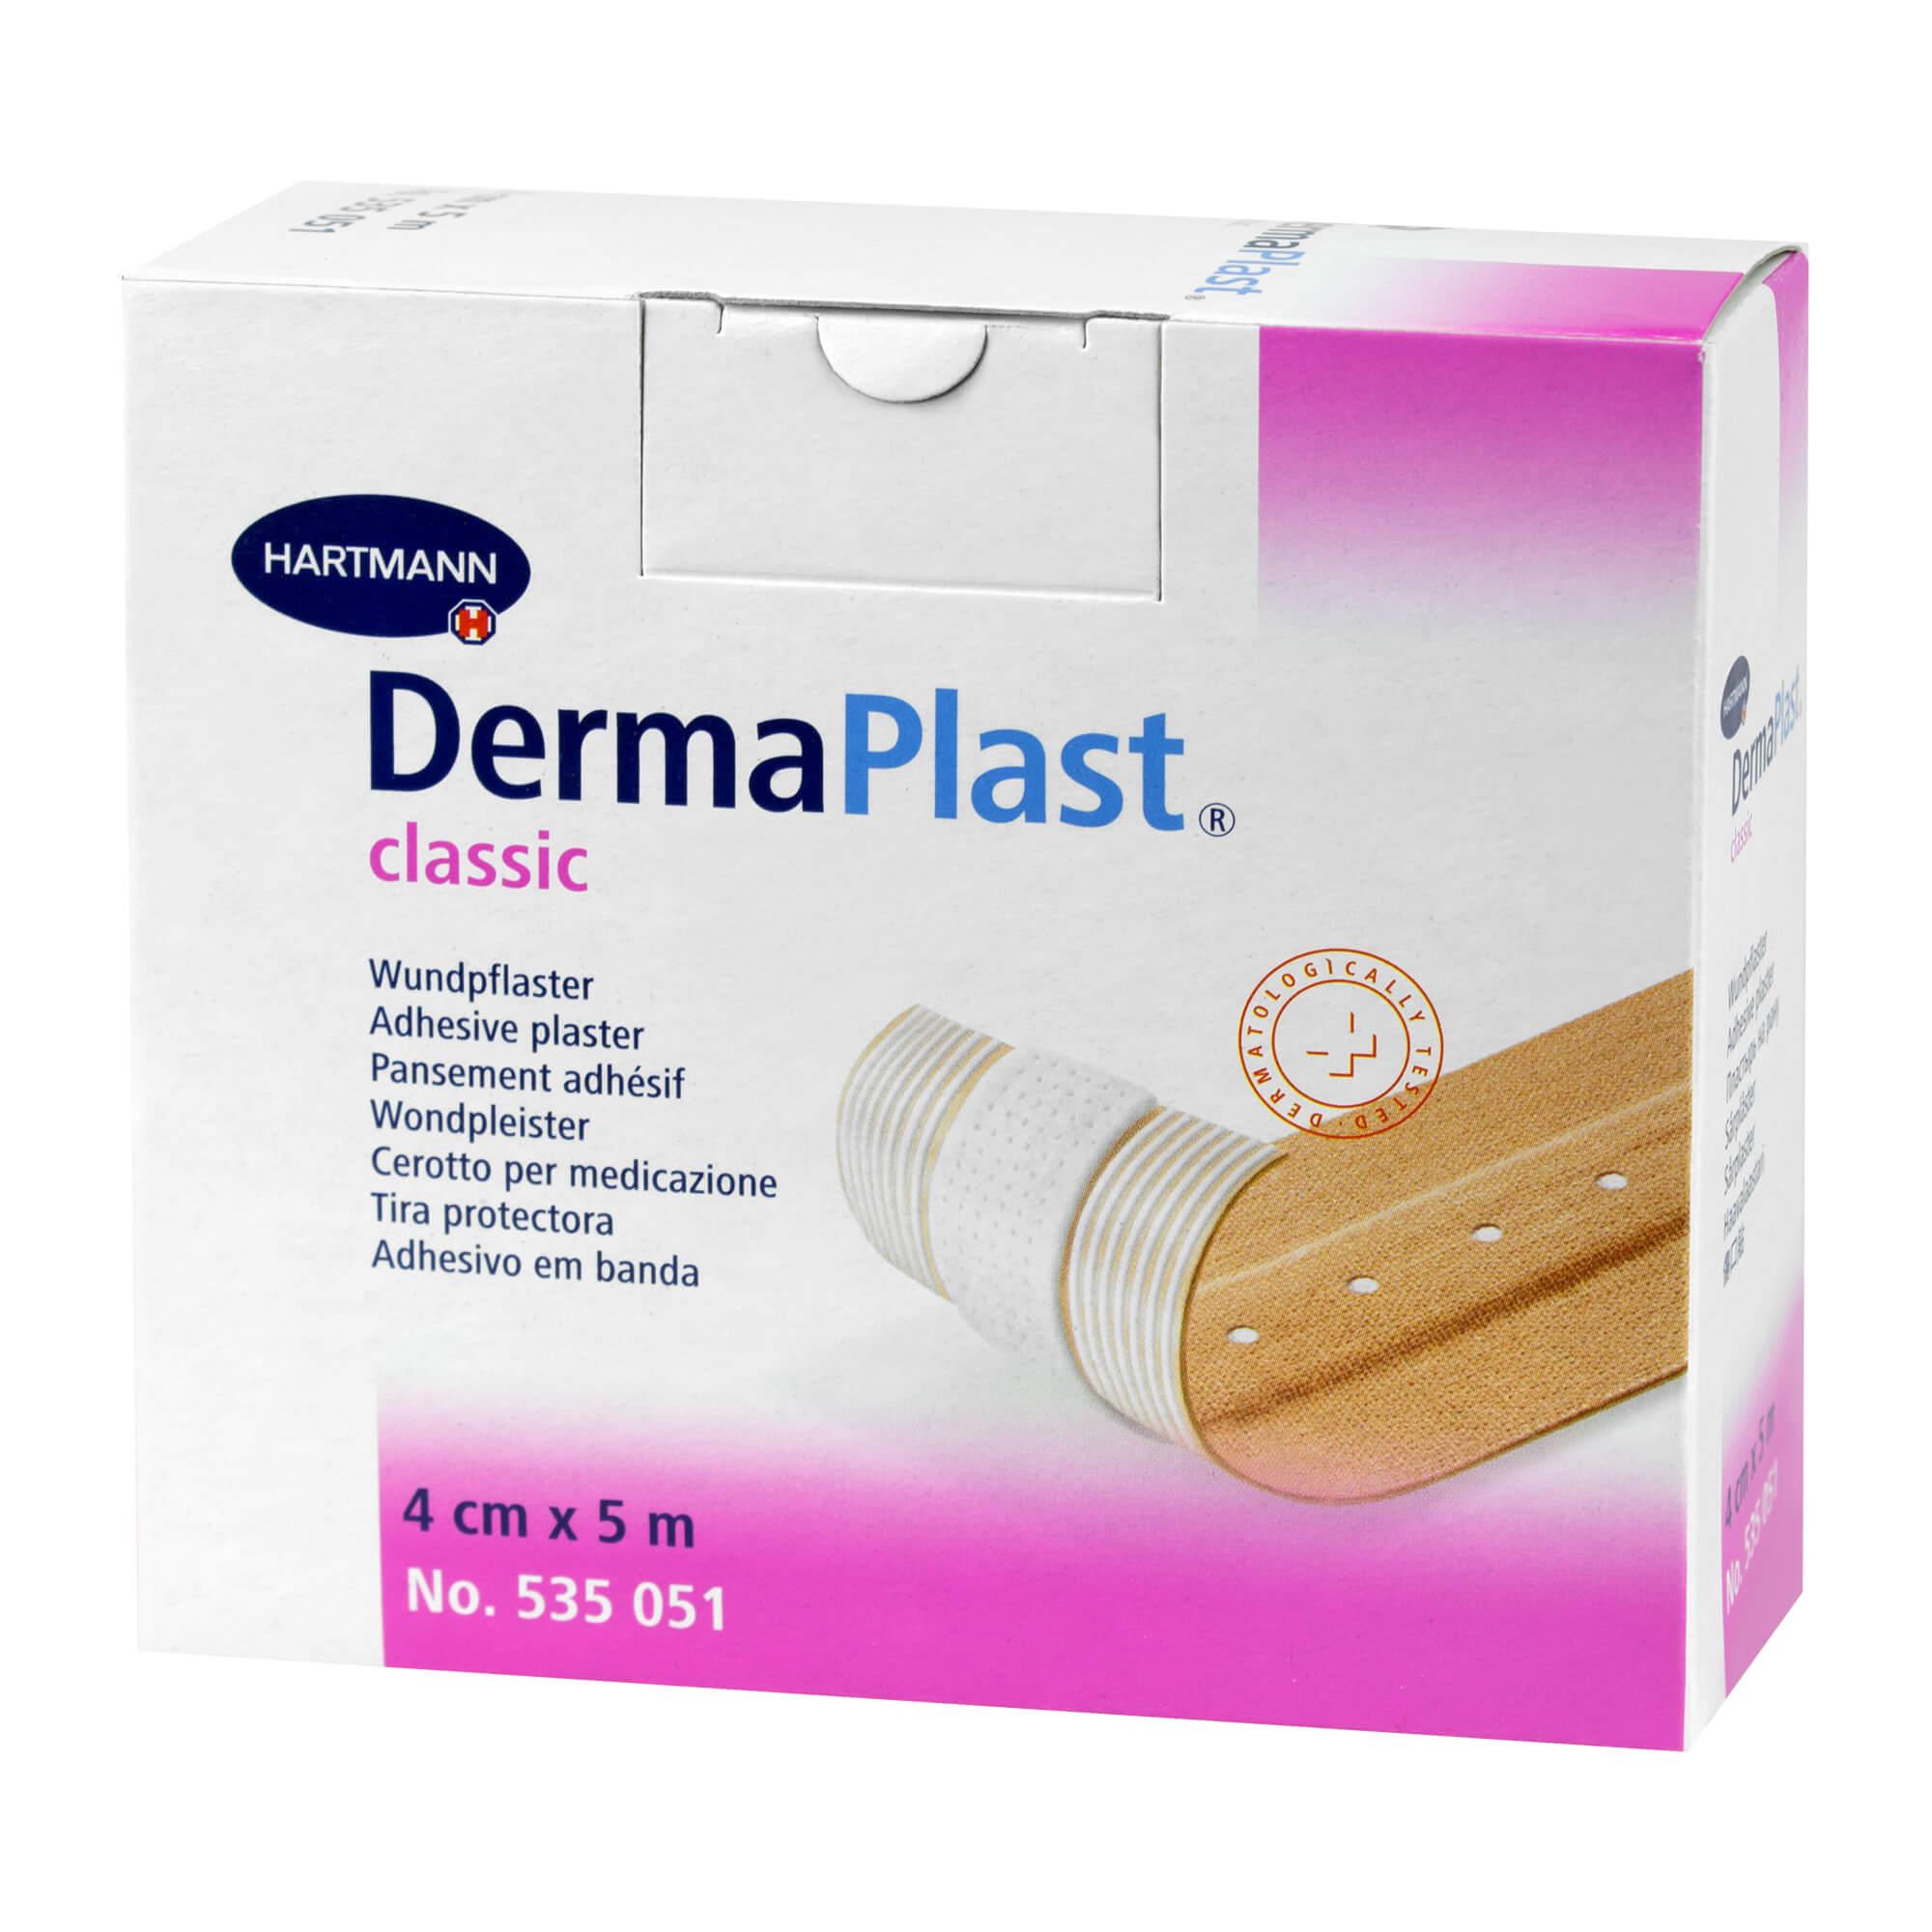 Dermaplast Classic Pflaster 4 cmx5 m